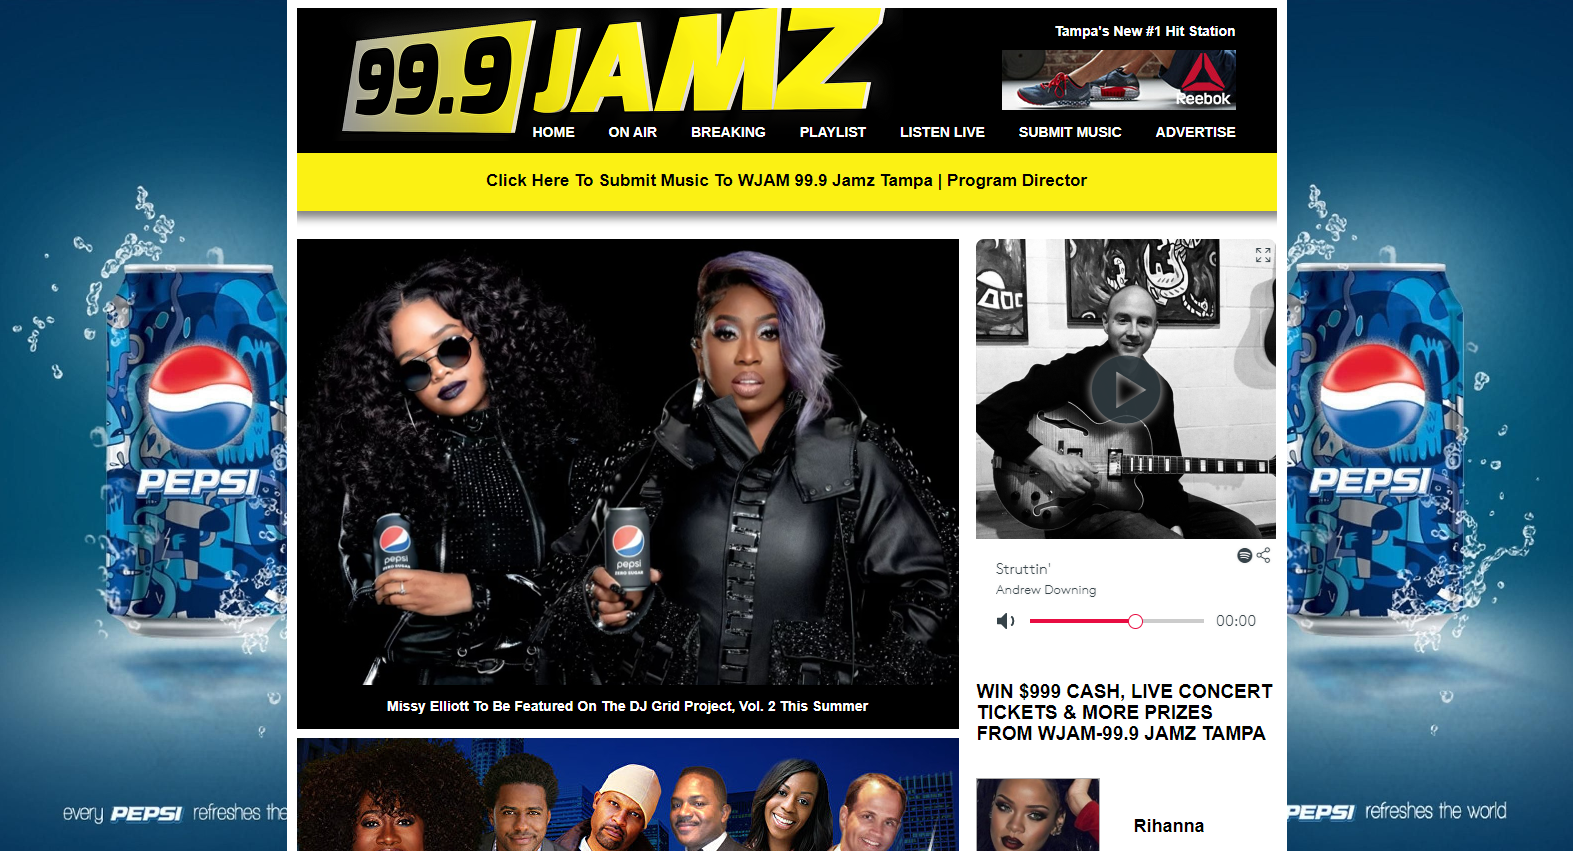 Promote Your Music On WJAM 99 JAMZ